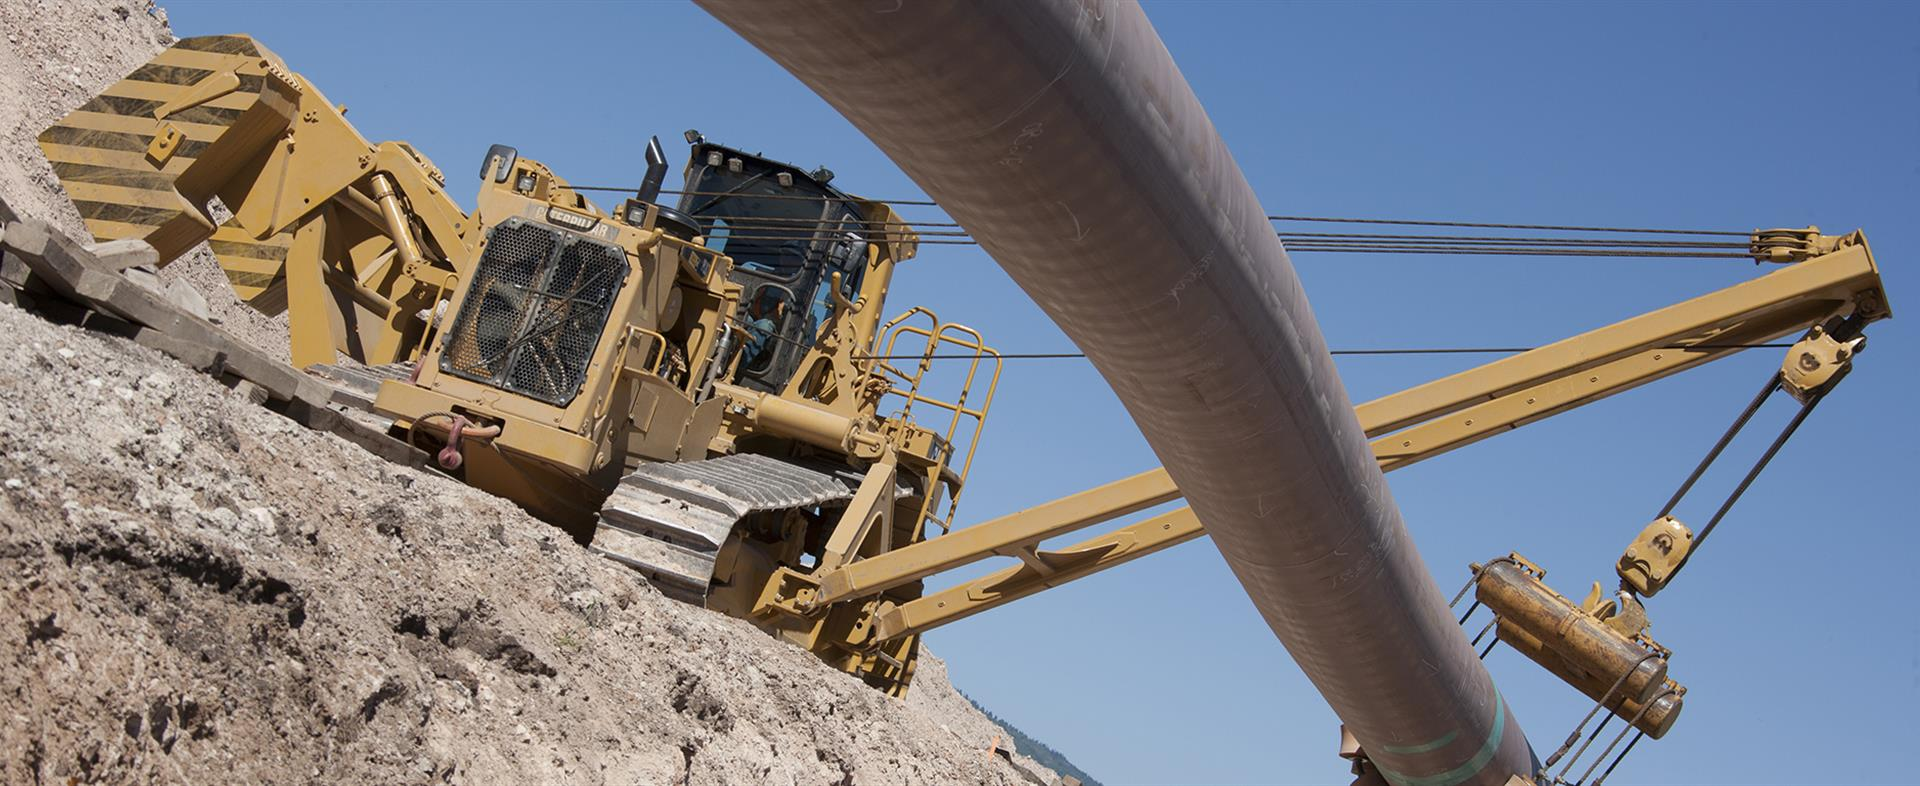 PL83 pipelayer sideboom pipeline construction equipment